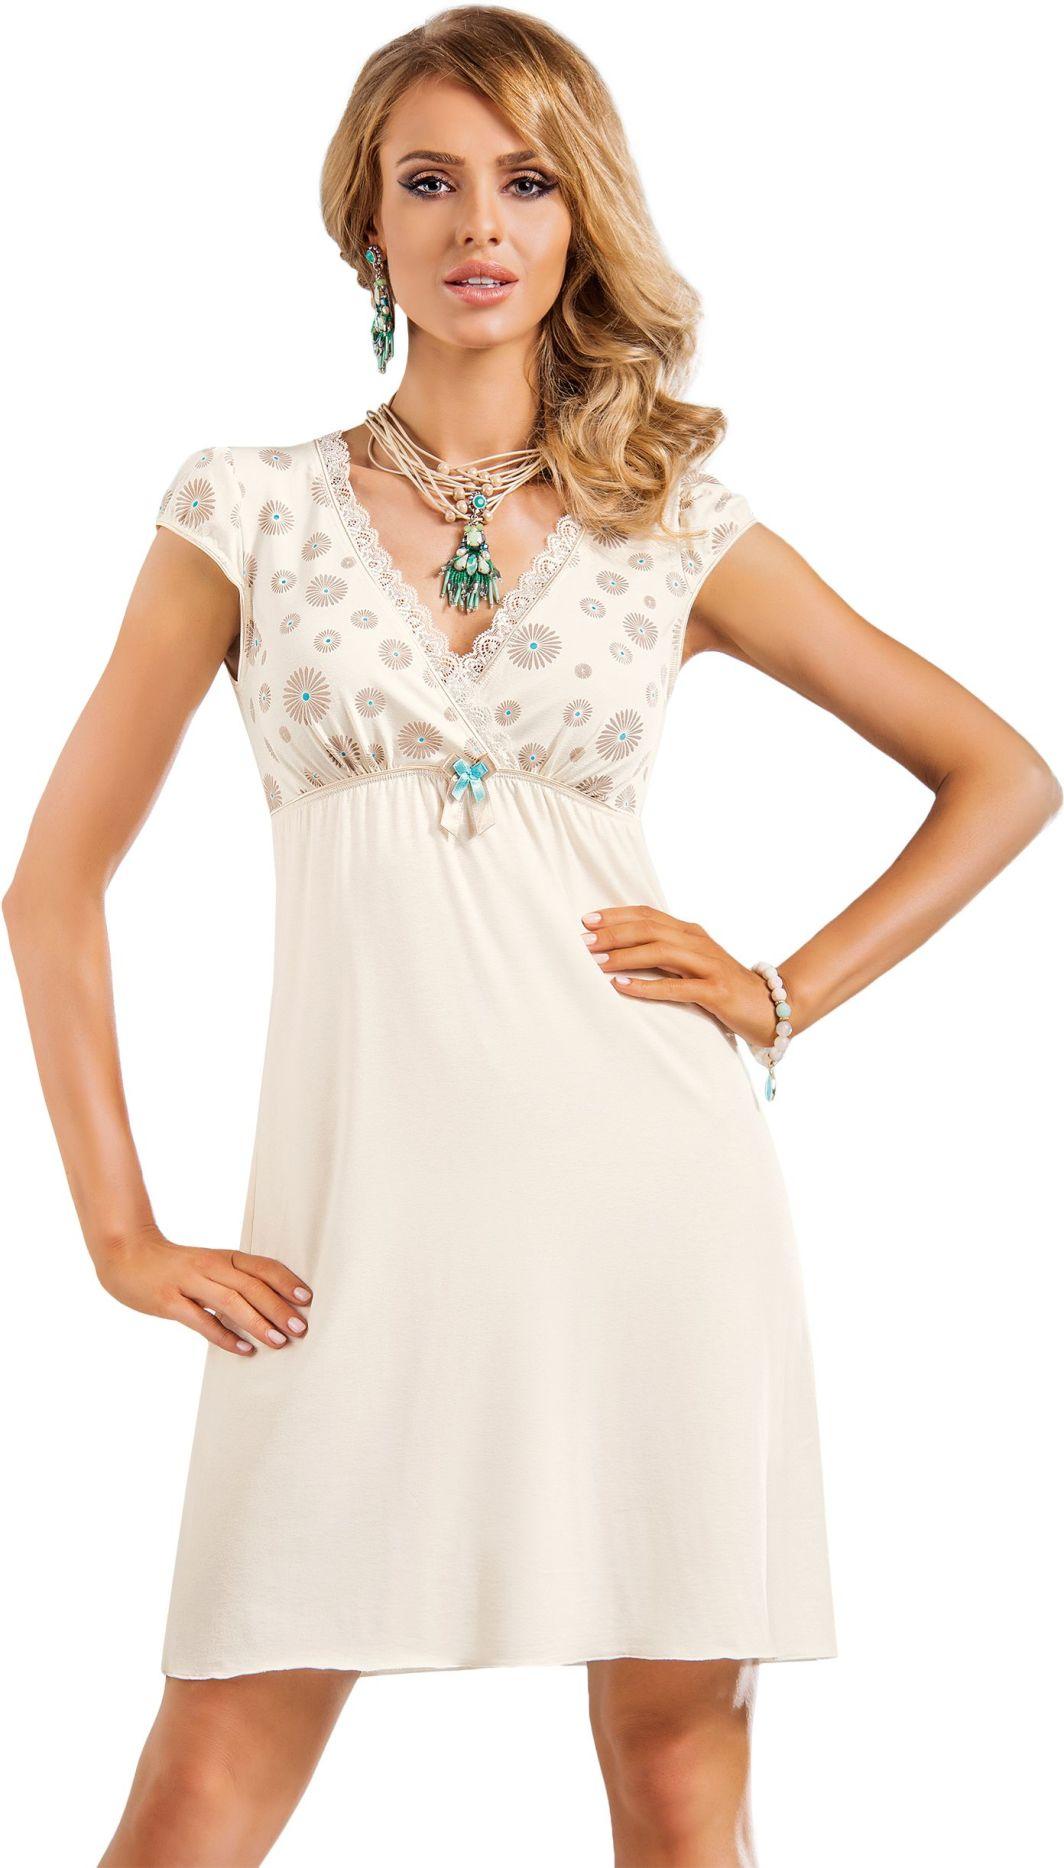 Donna Koszulka nocna Fabia kremowa r. 4XL 1